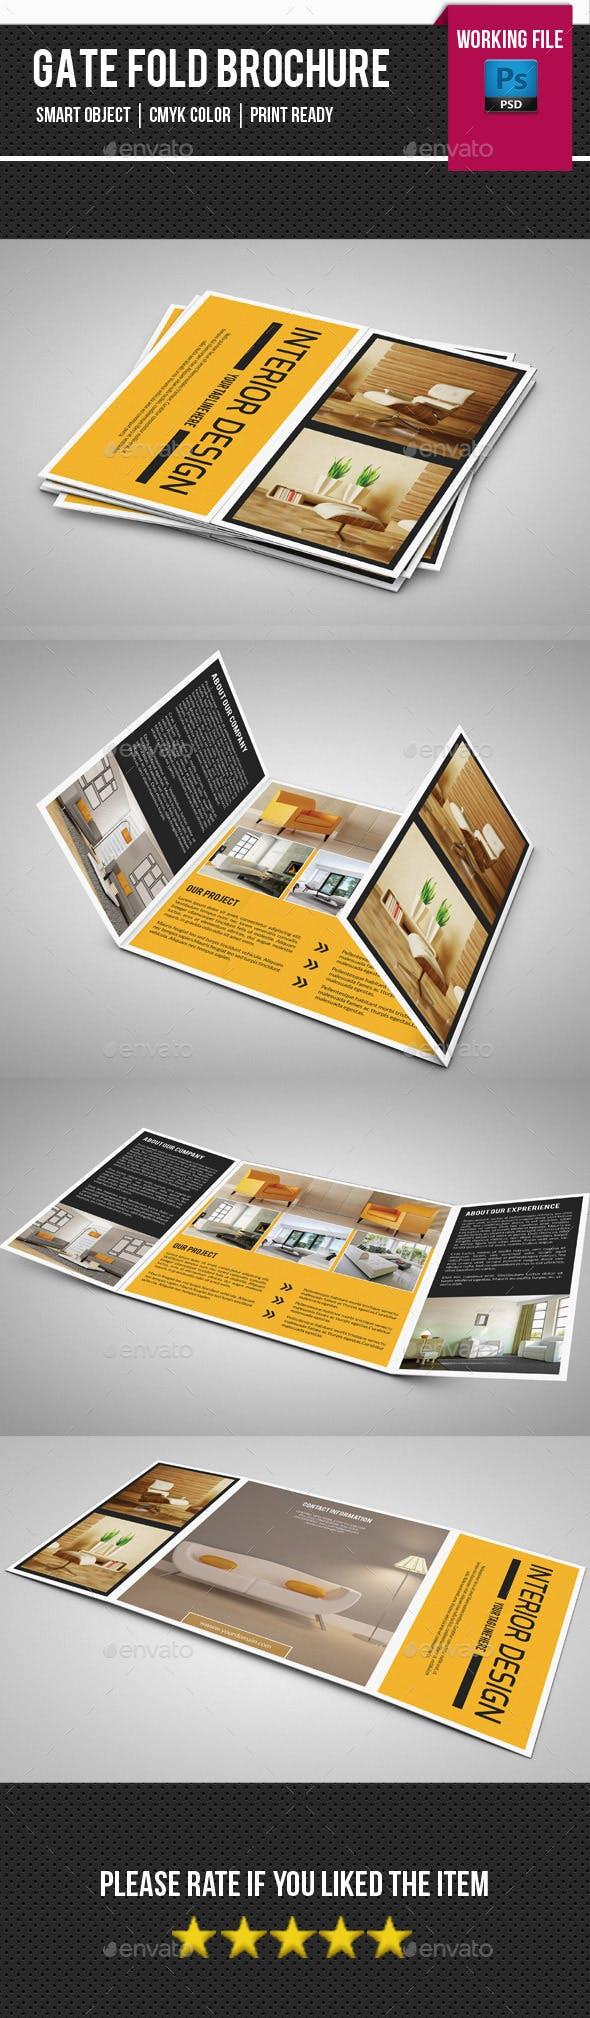 Square Gate fold Interior Brochure - SiStec